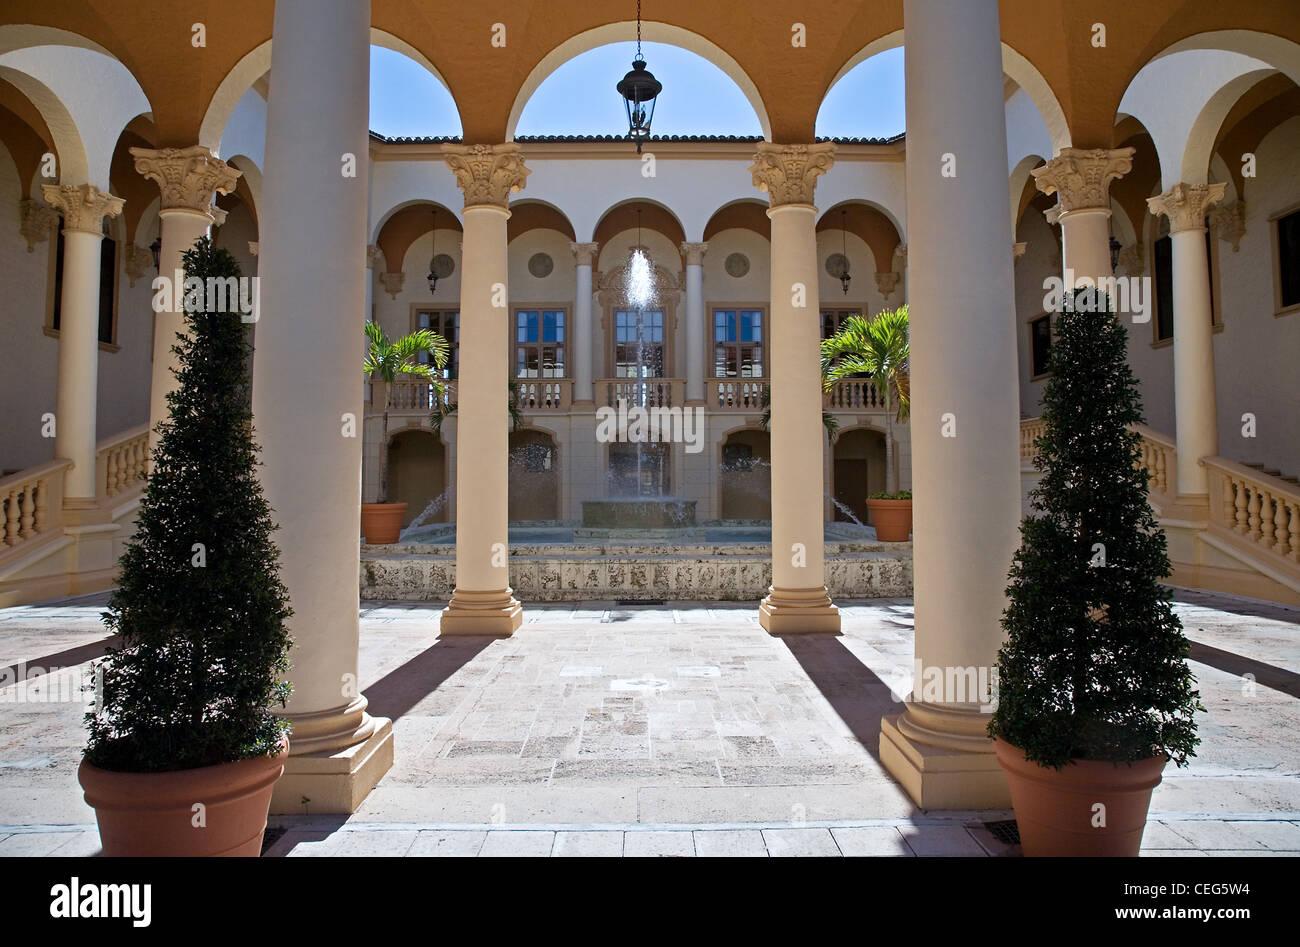 Biltmore hotel, Miami, Florida, USA - Stock Image